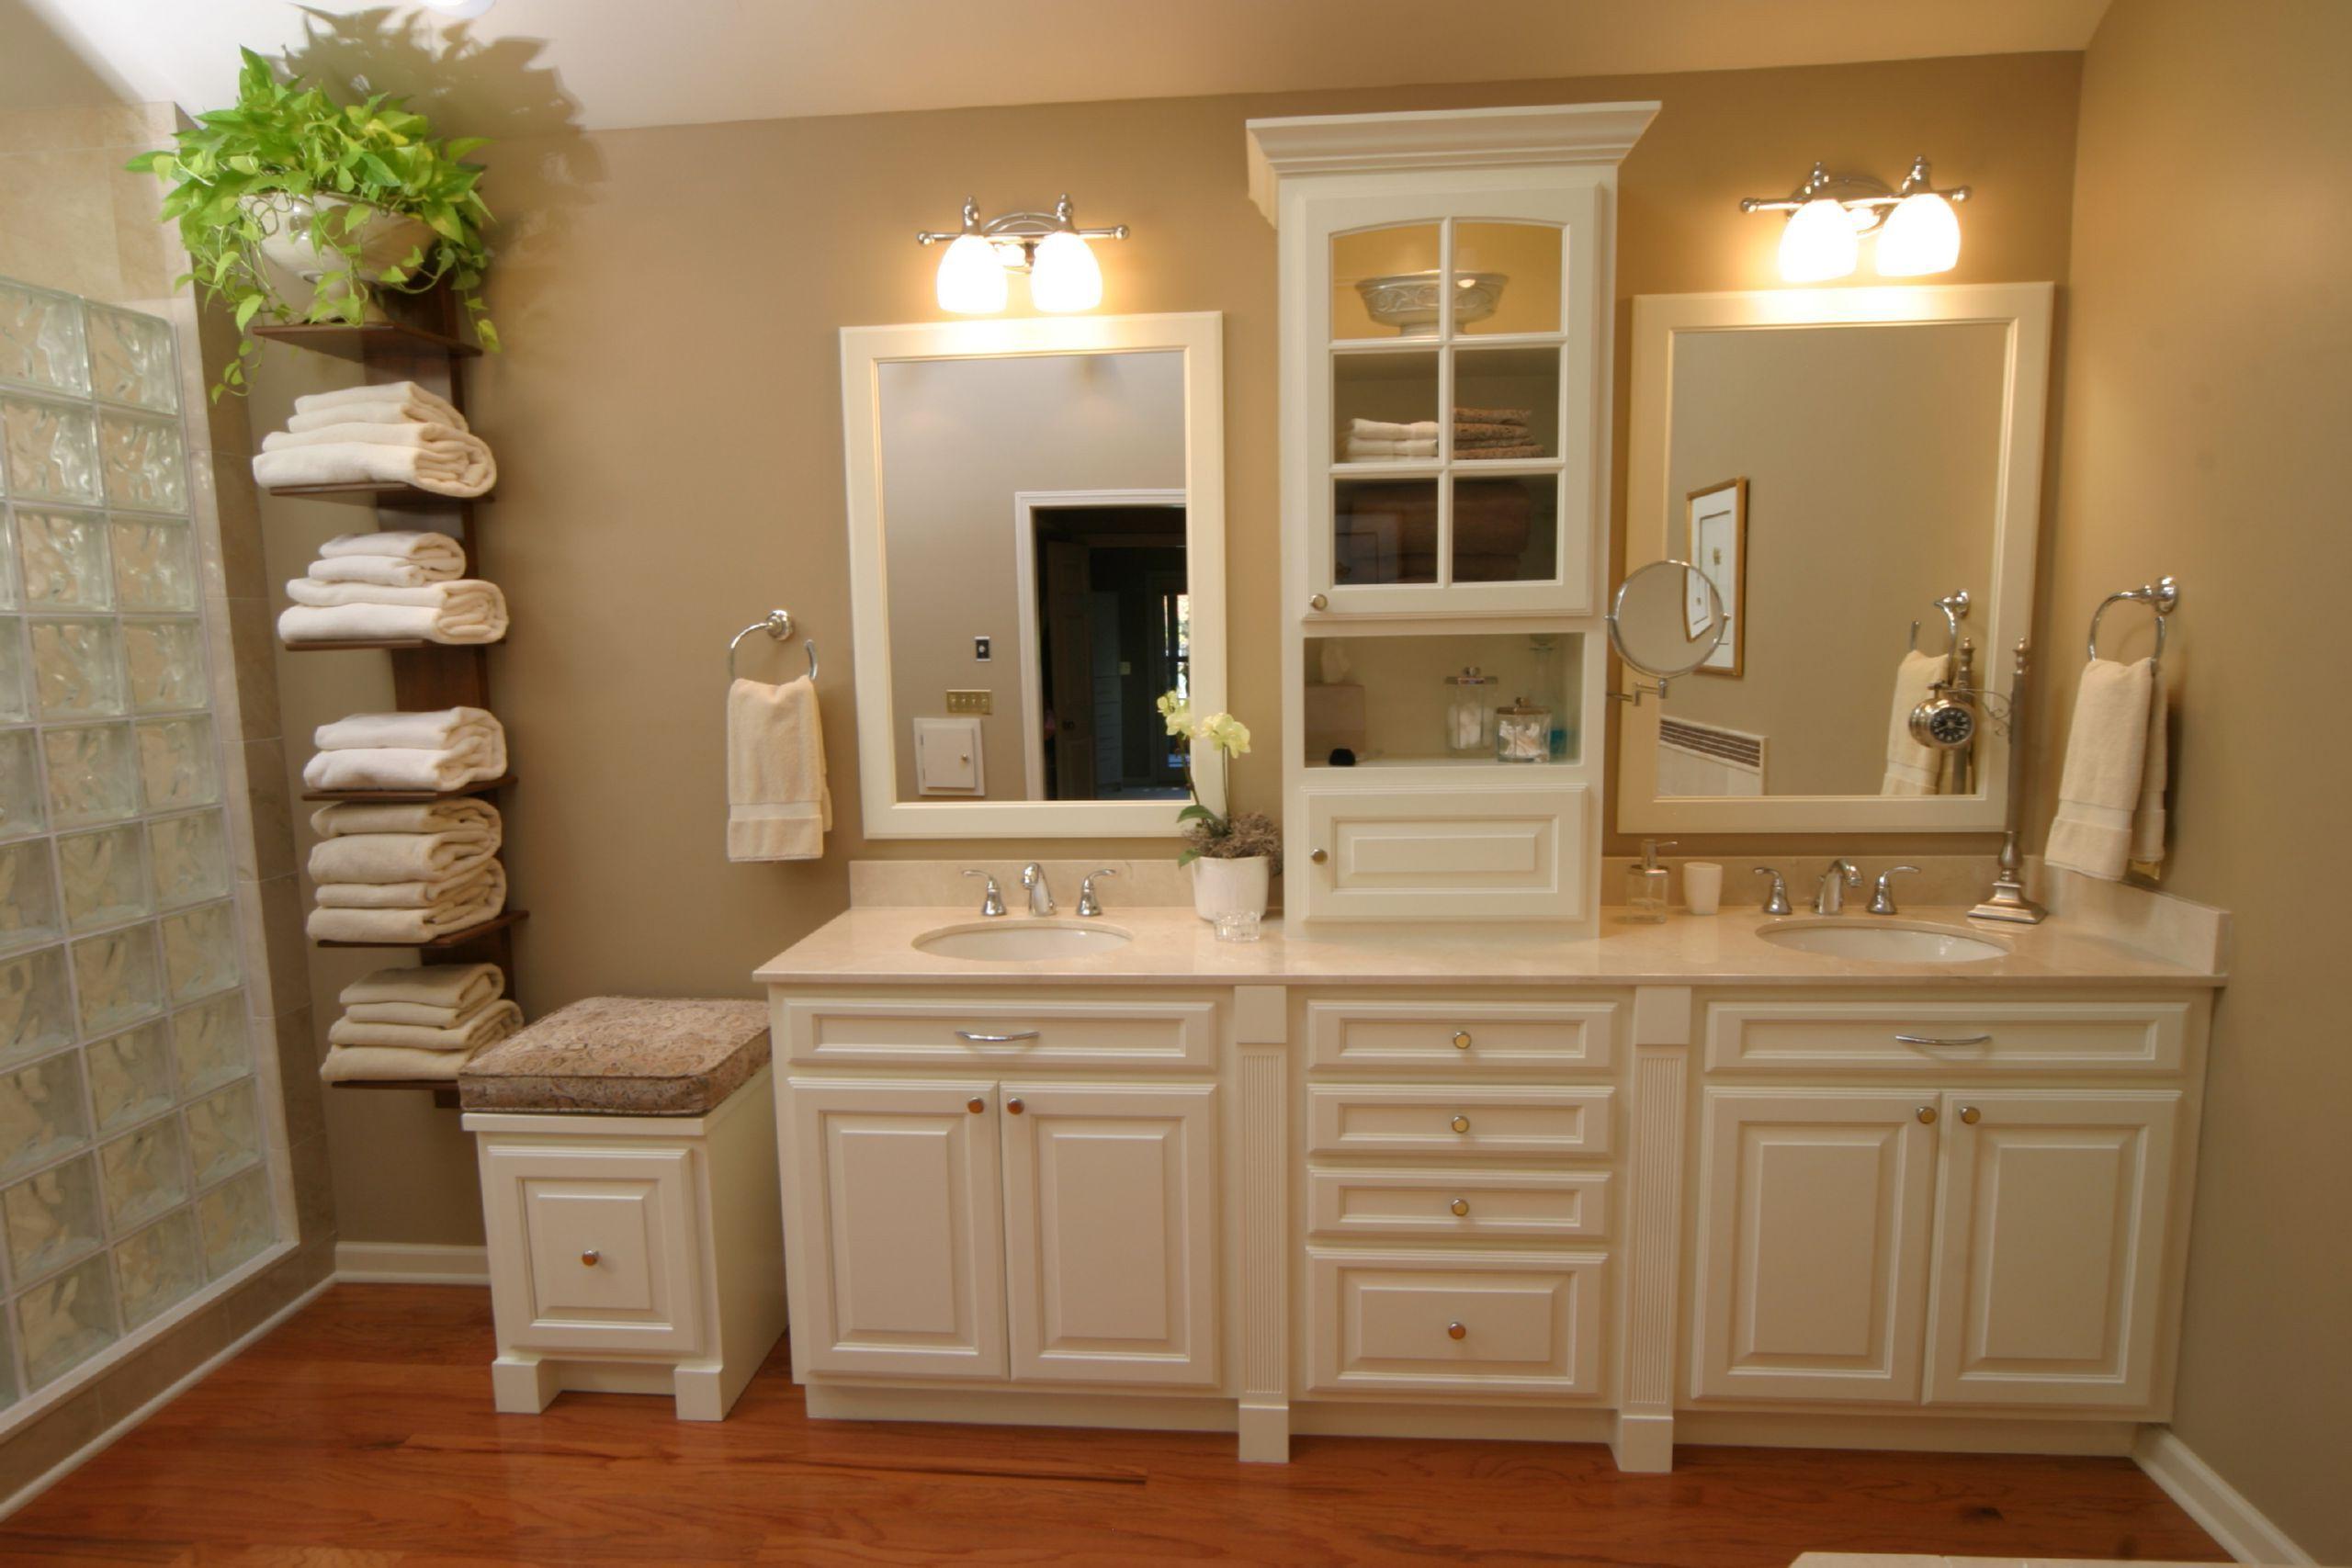 Distinguished Diy Bathroom Counter Storage Bathroom Counter regarding sizing 2560 X 1707